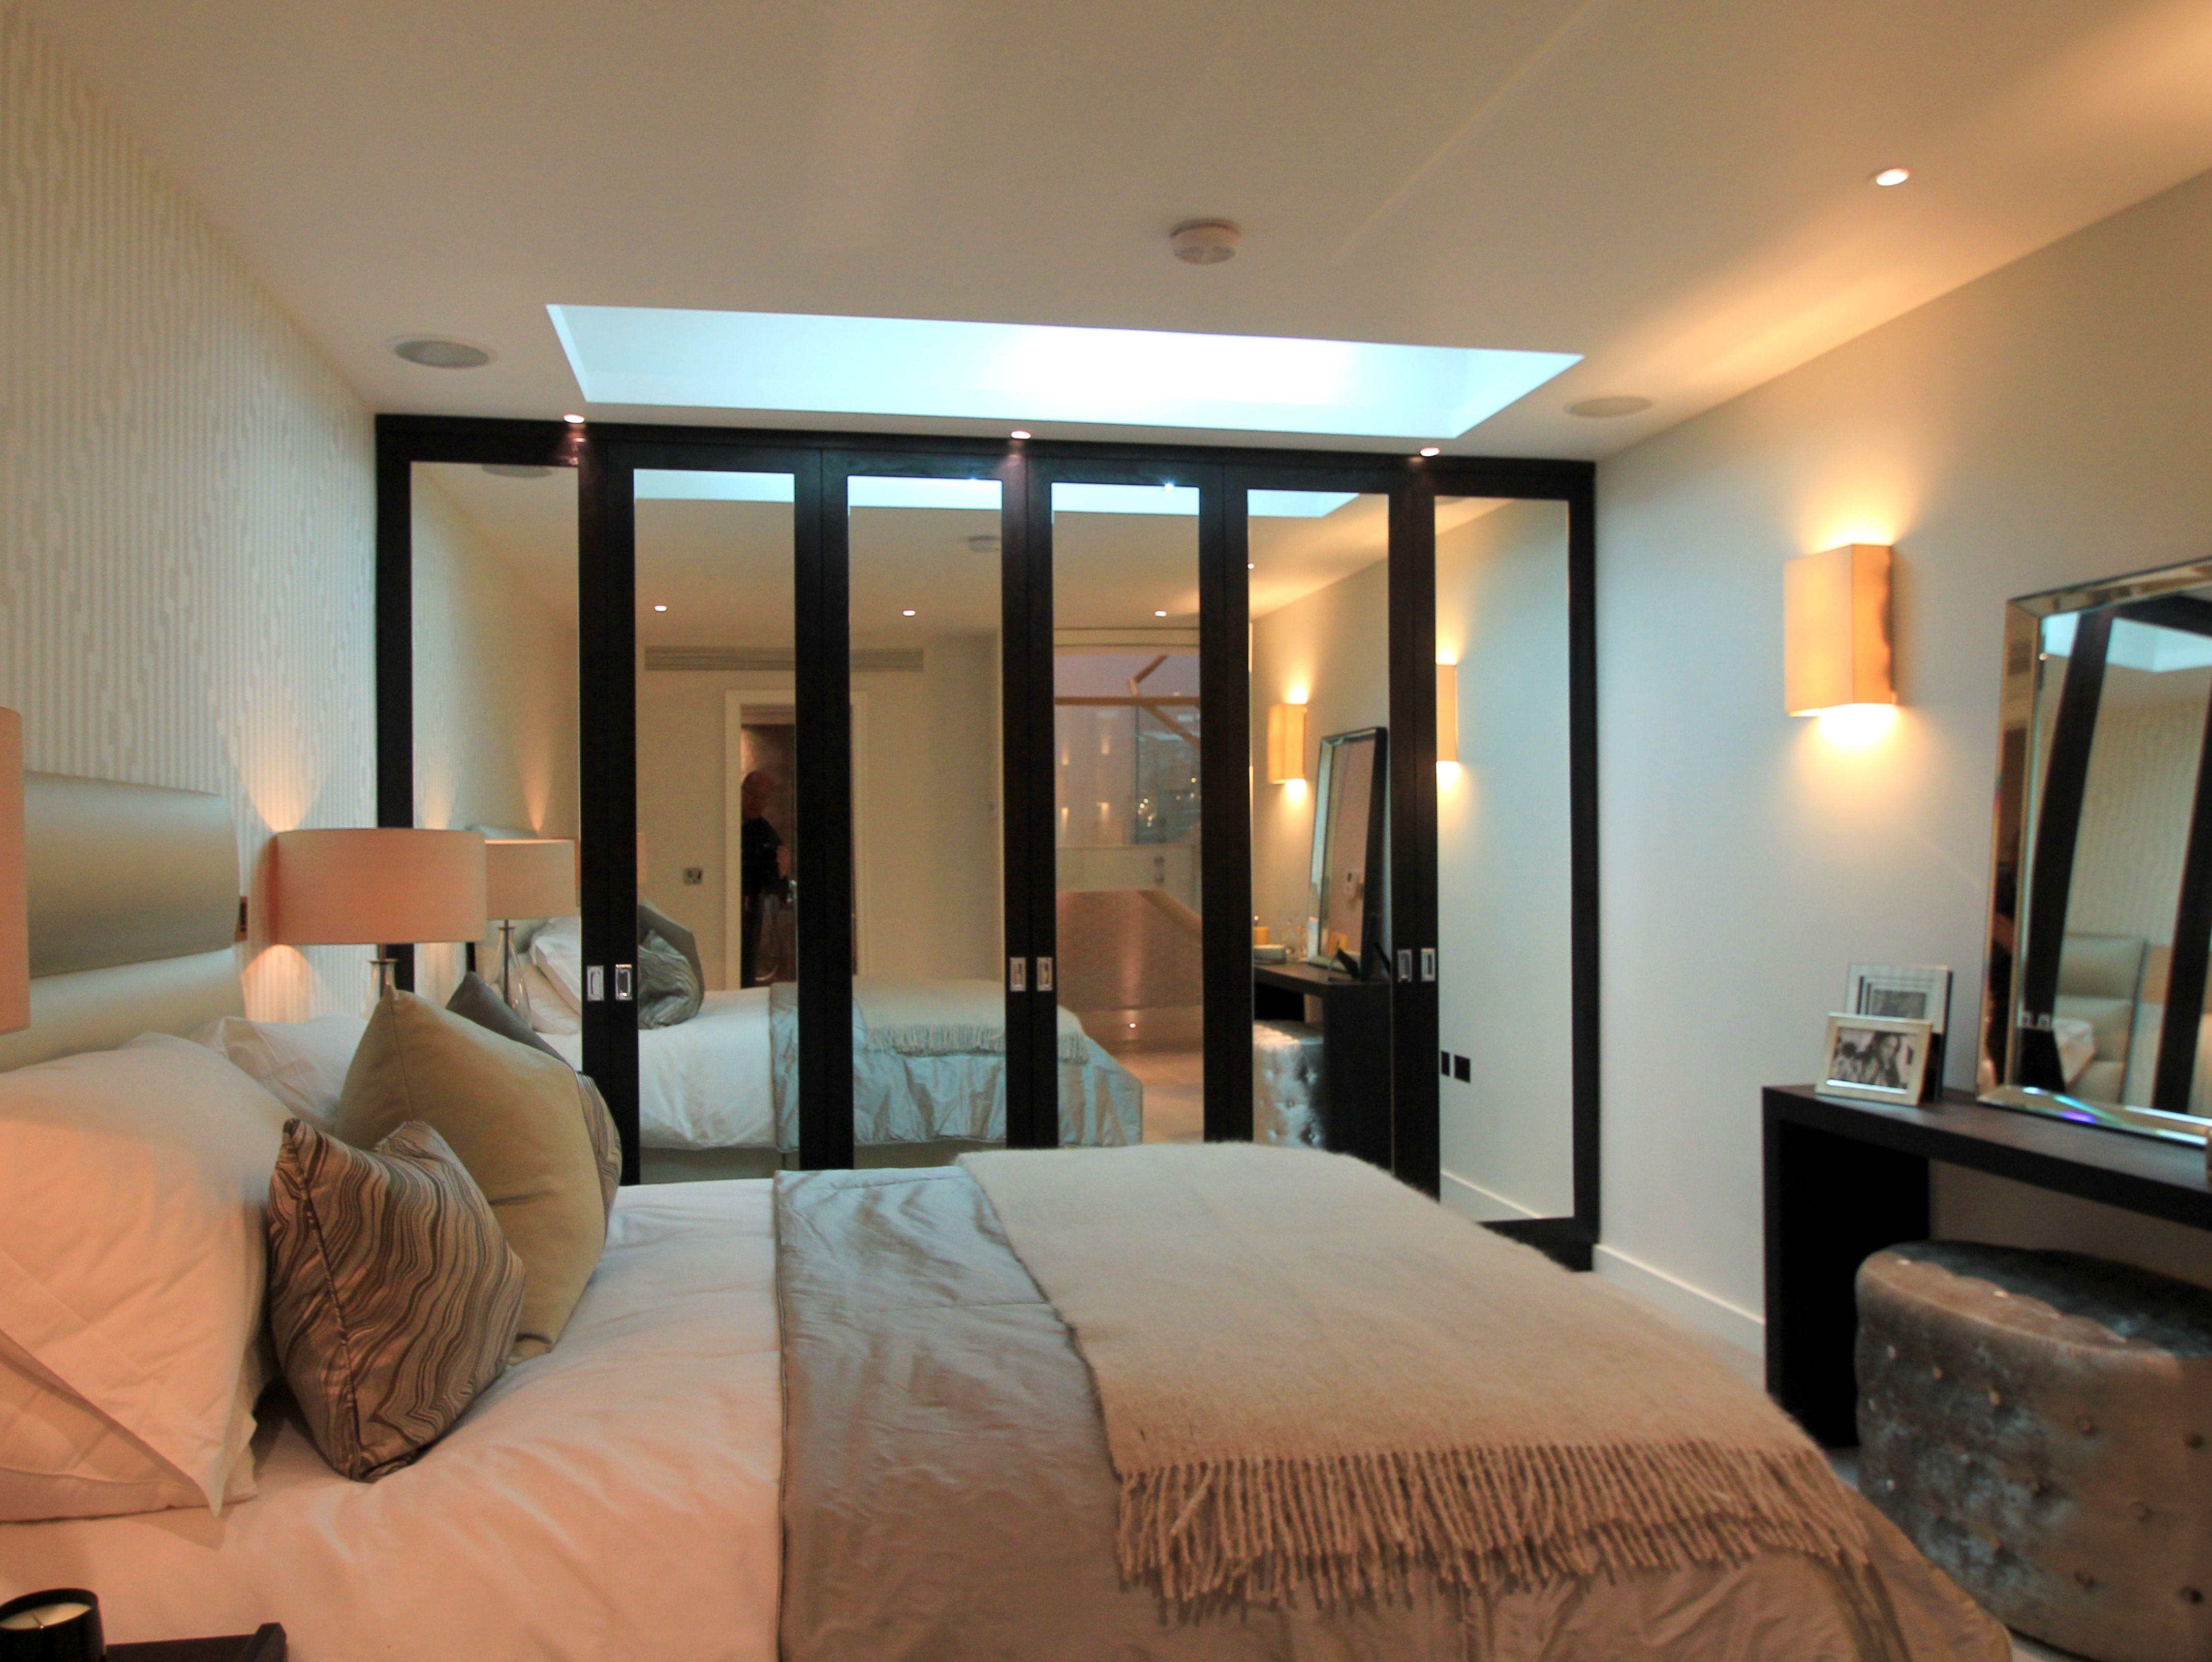 Parans Sp3 Brings Direct Sunlight Into A London Basement Bedroom Basement Ideas Pinterest